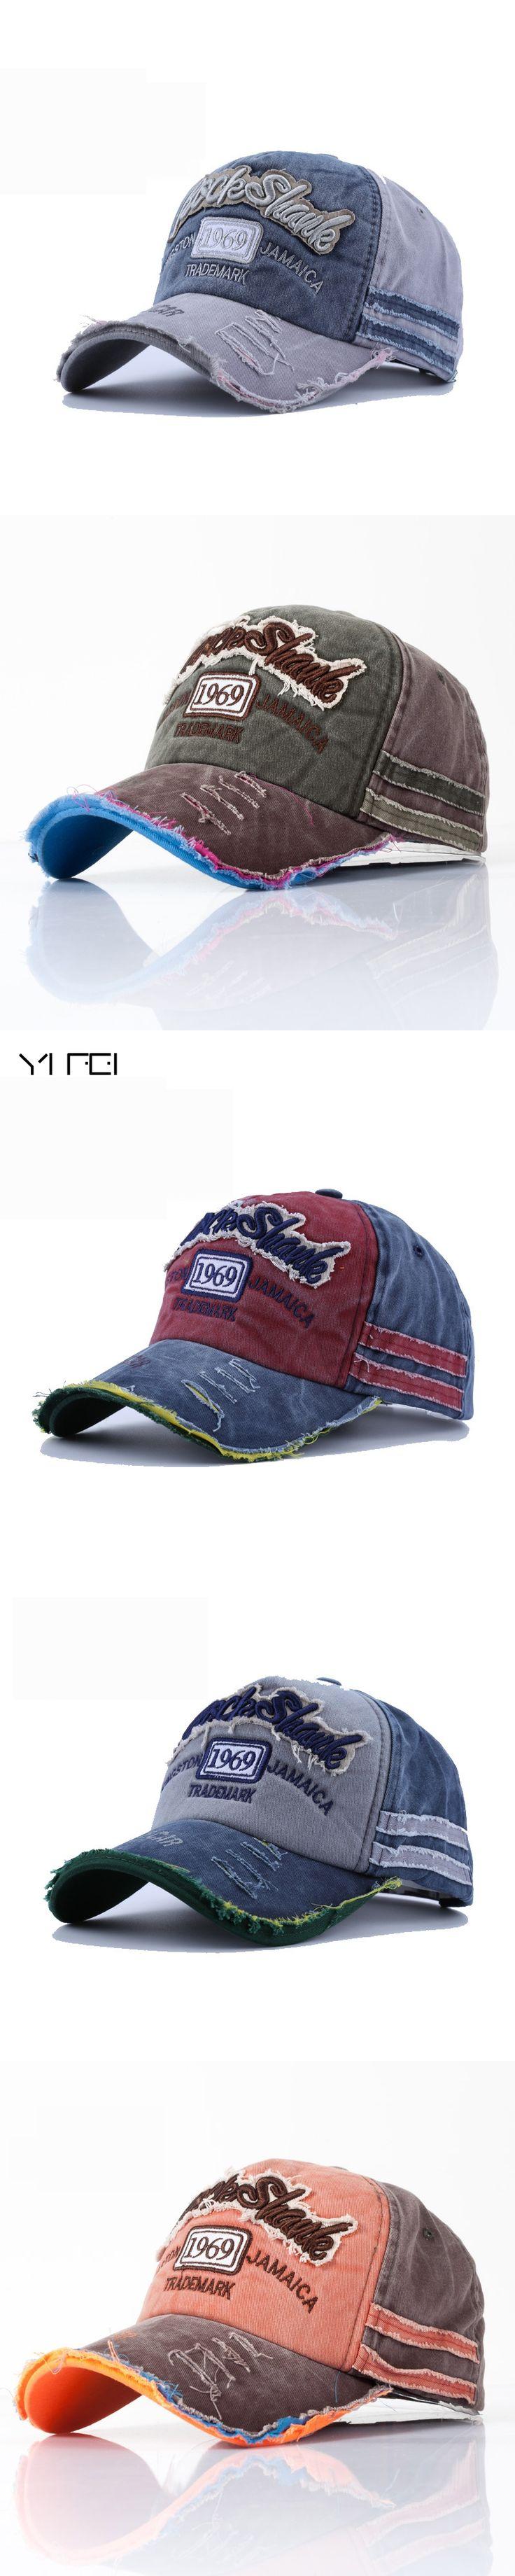 2017 Brand Baseball Cap Men Snapback Cap Hat Women Vintage Baseball Hat For Men Casquette Bone Sports Cap Sun Hat Gorras 6 Panel